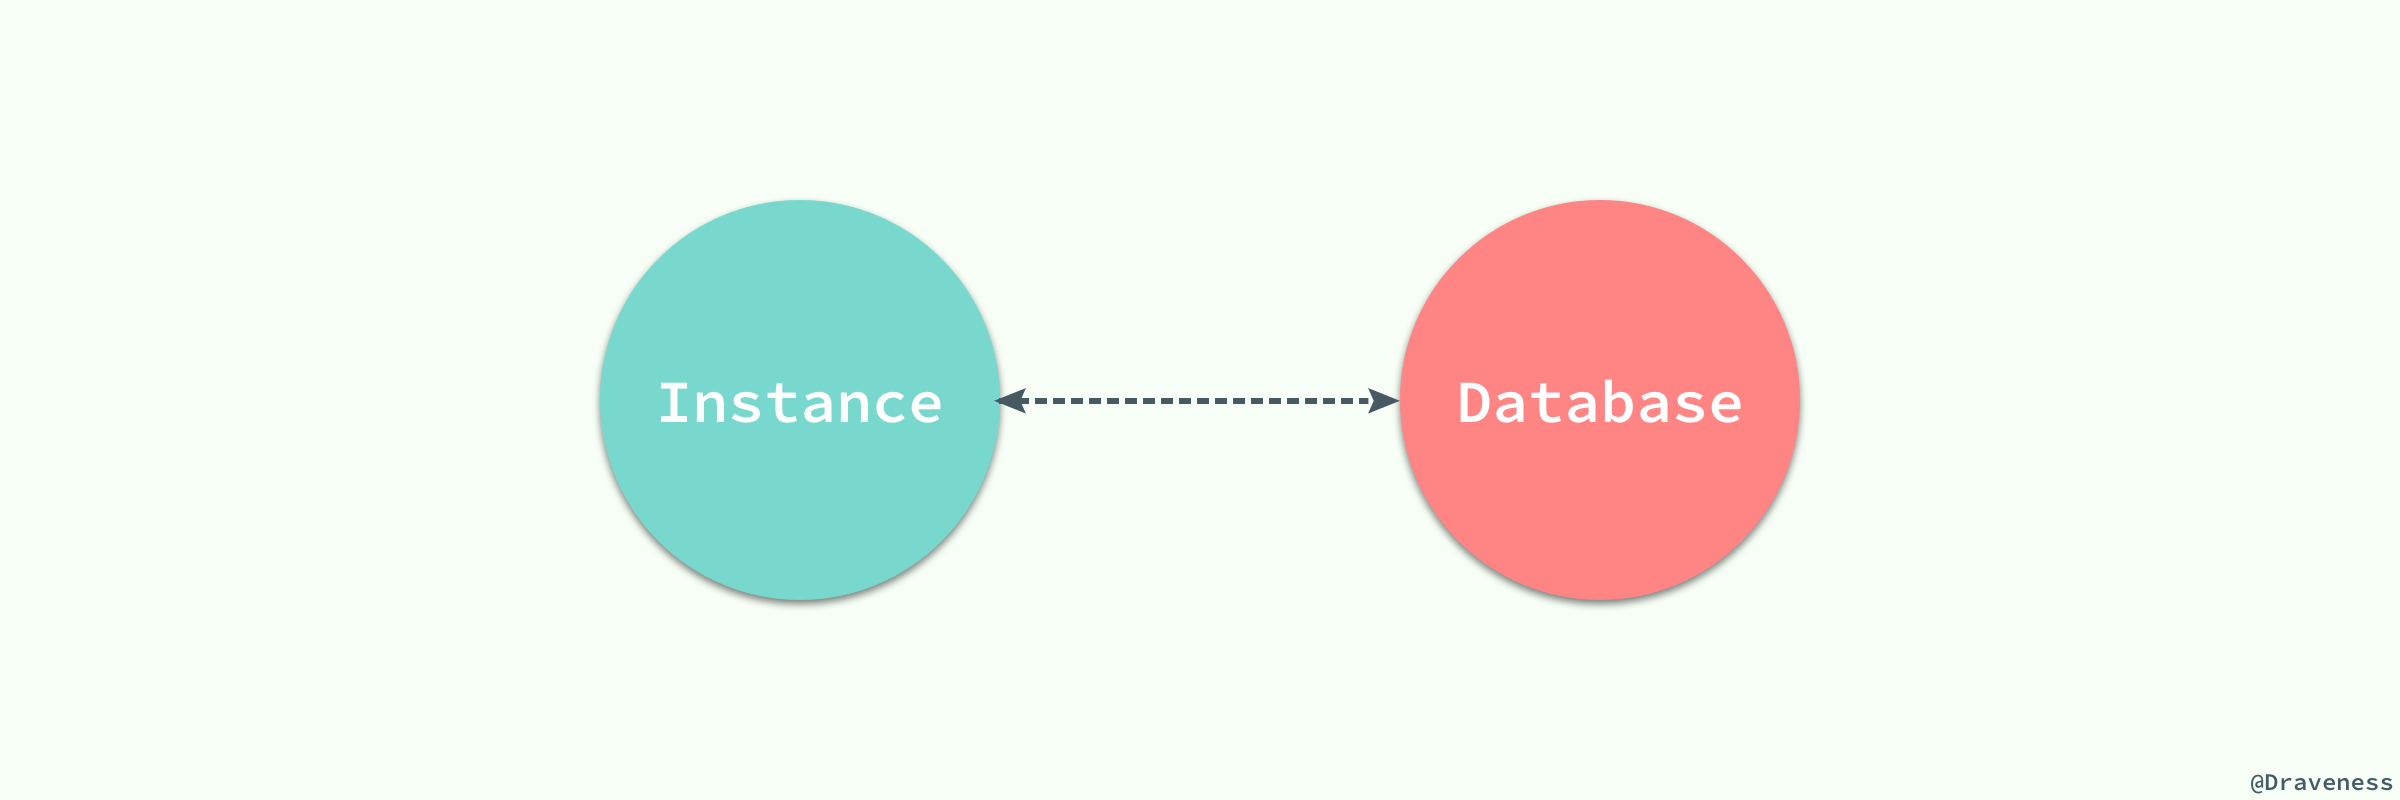 Database - Instance